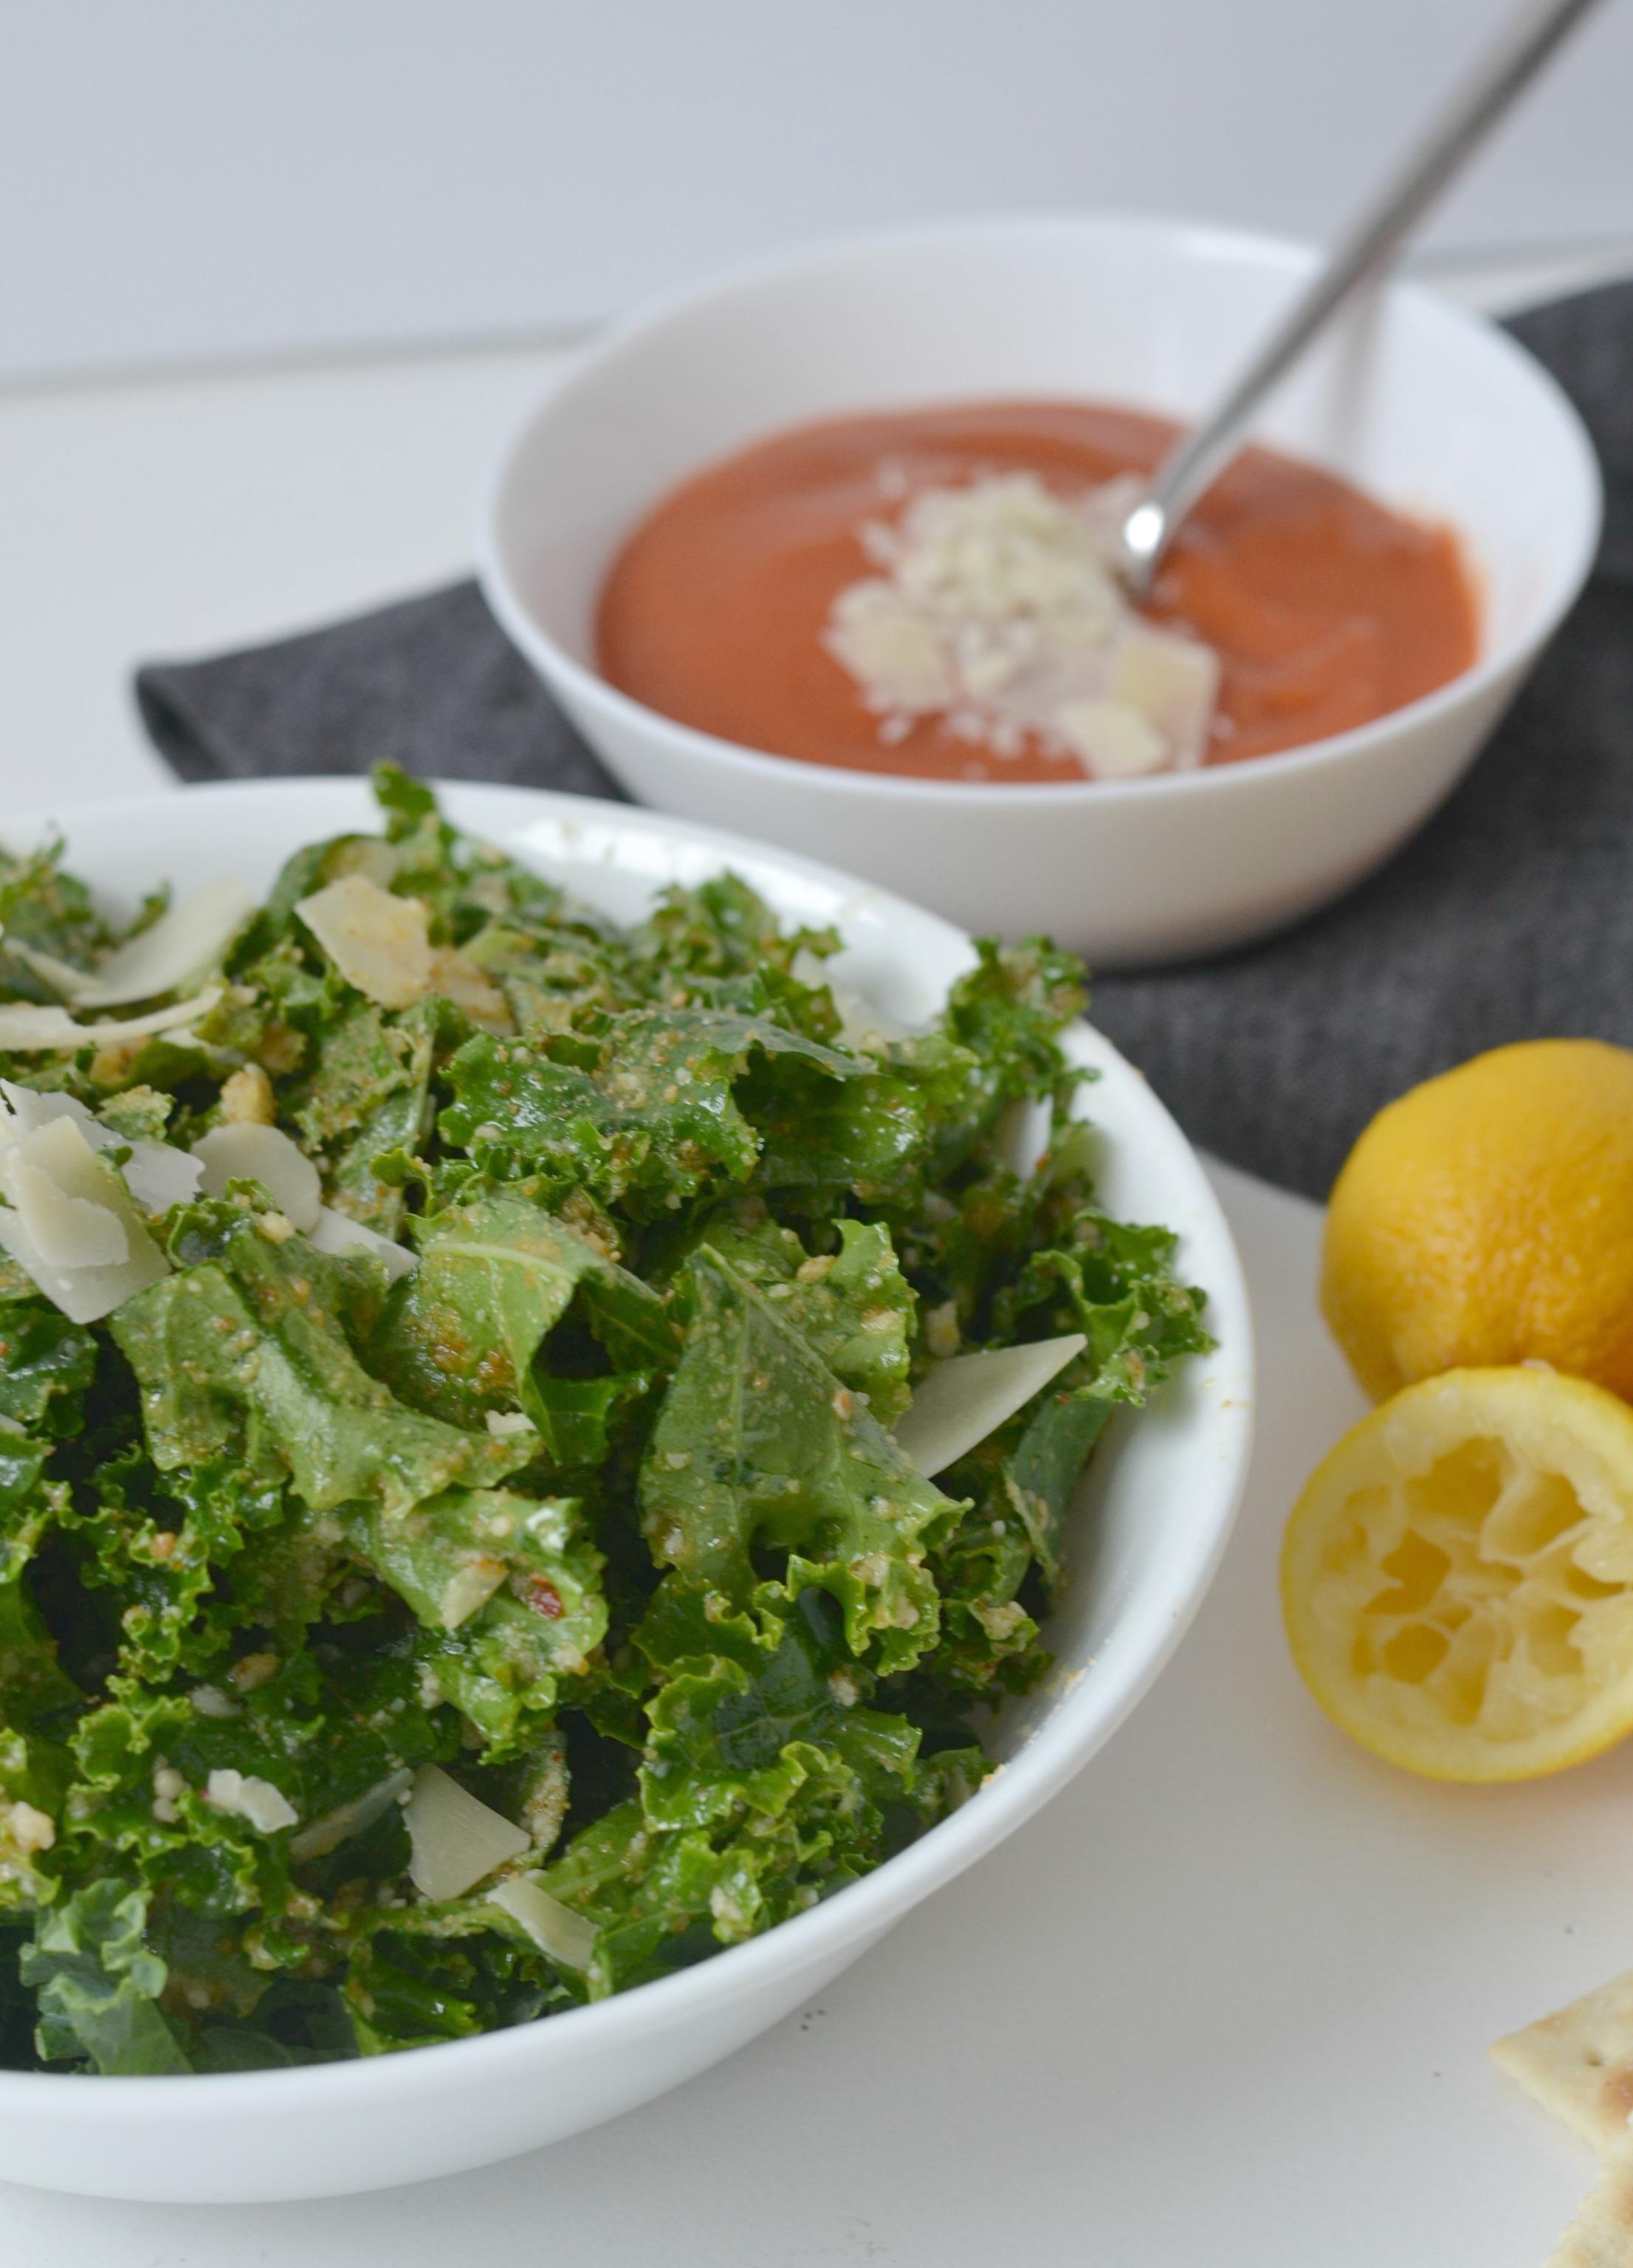 Kale and Parmesan Salad